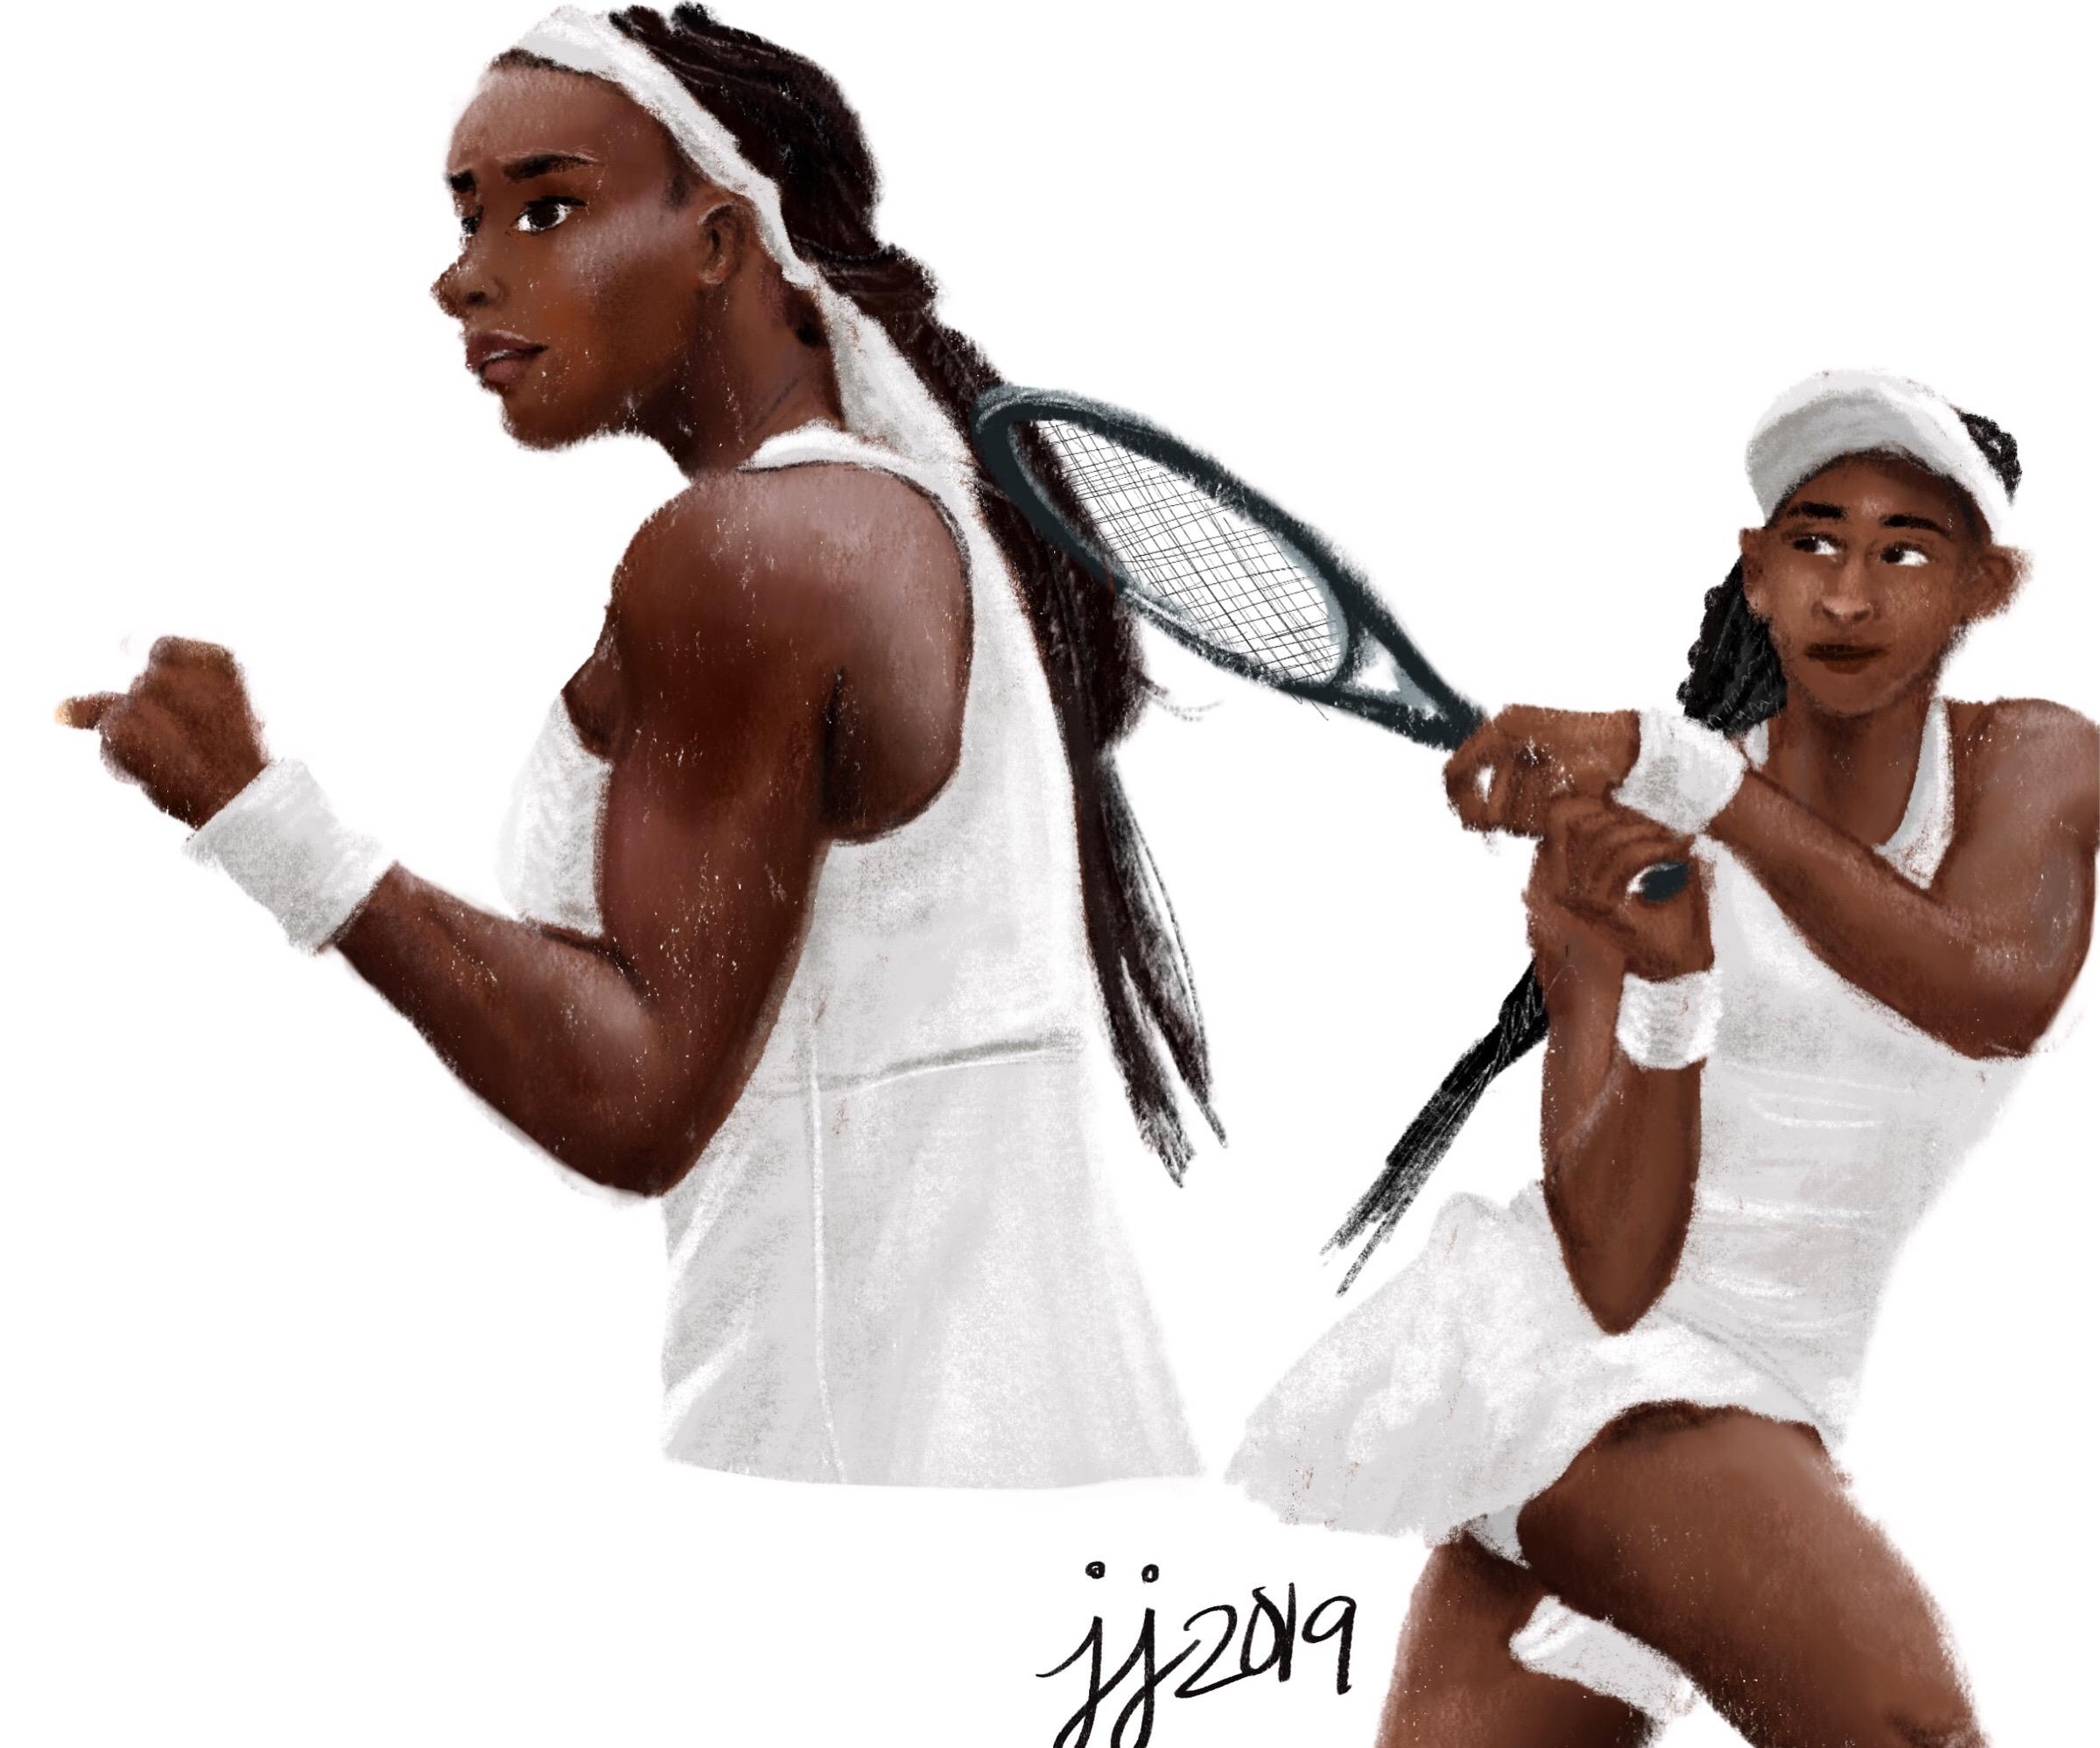 Cori Gauff, Tennis Prodigy